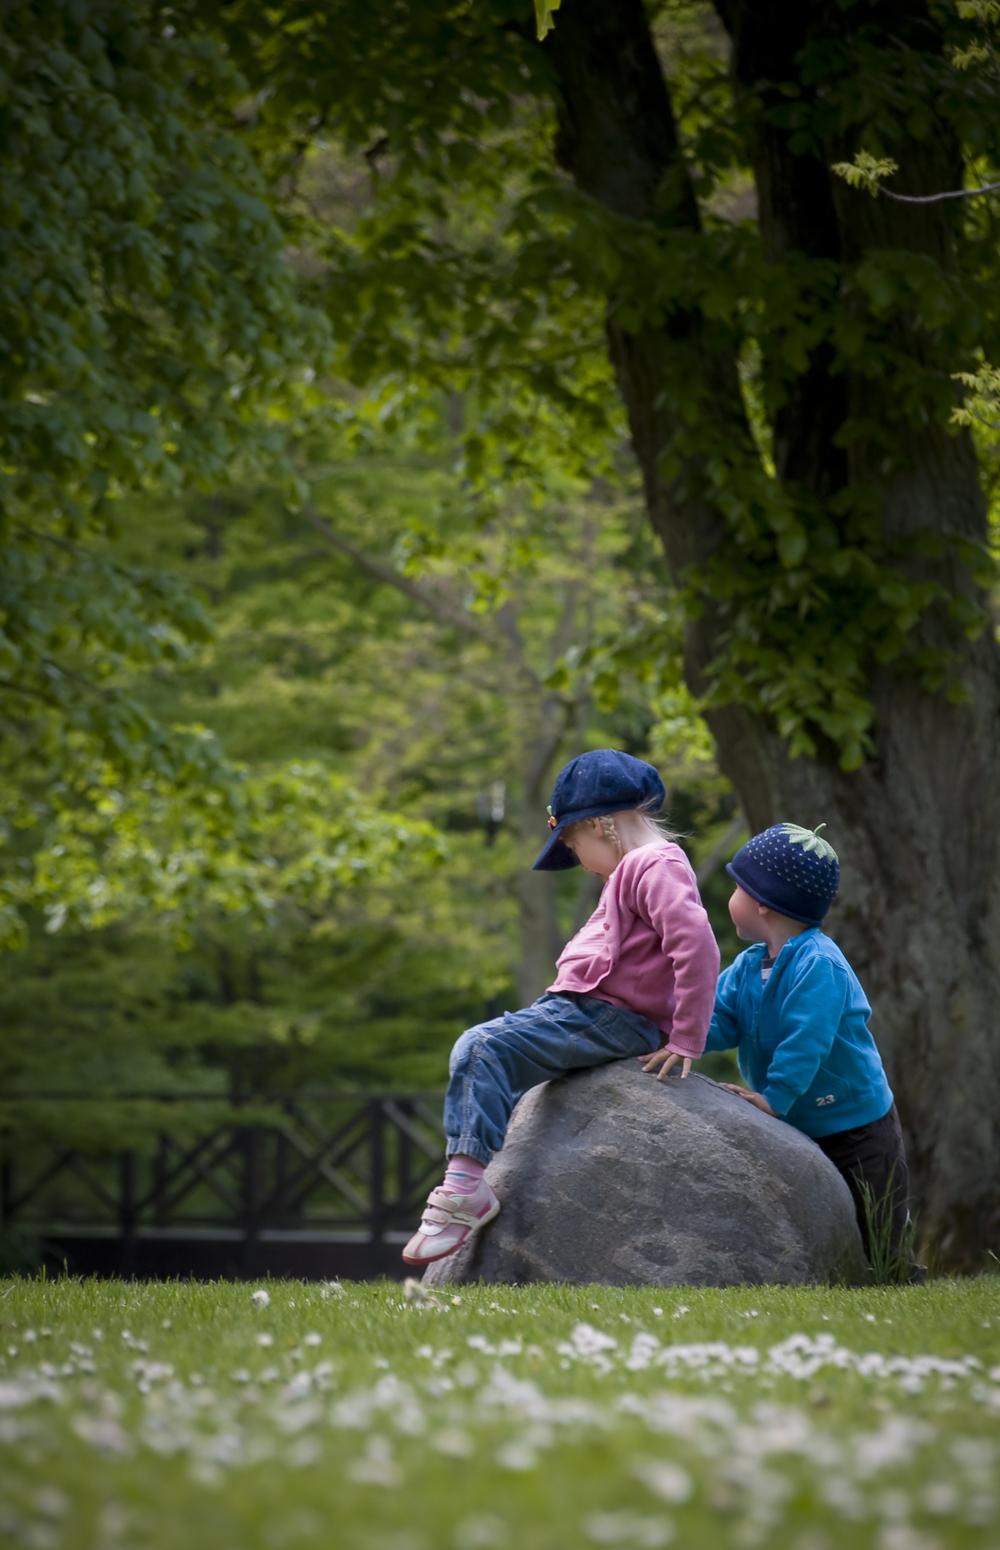 Kids Enjoying the Park